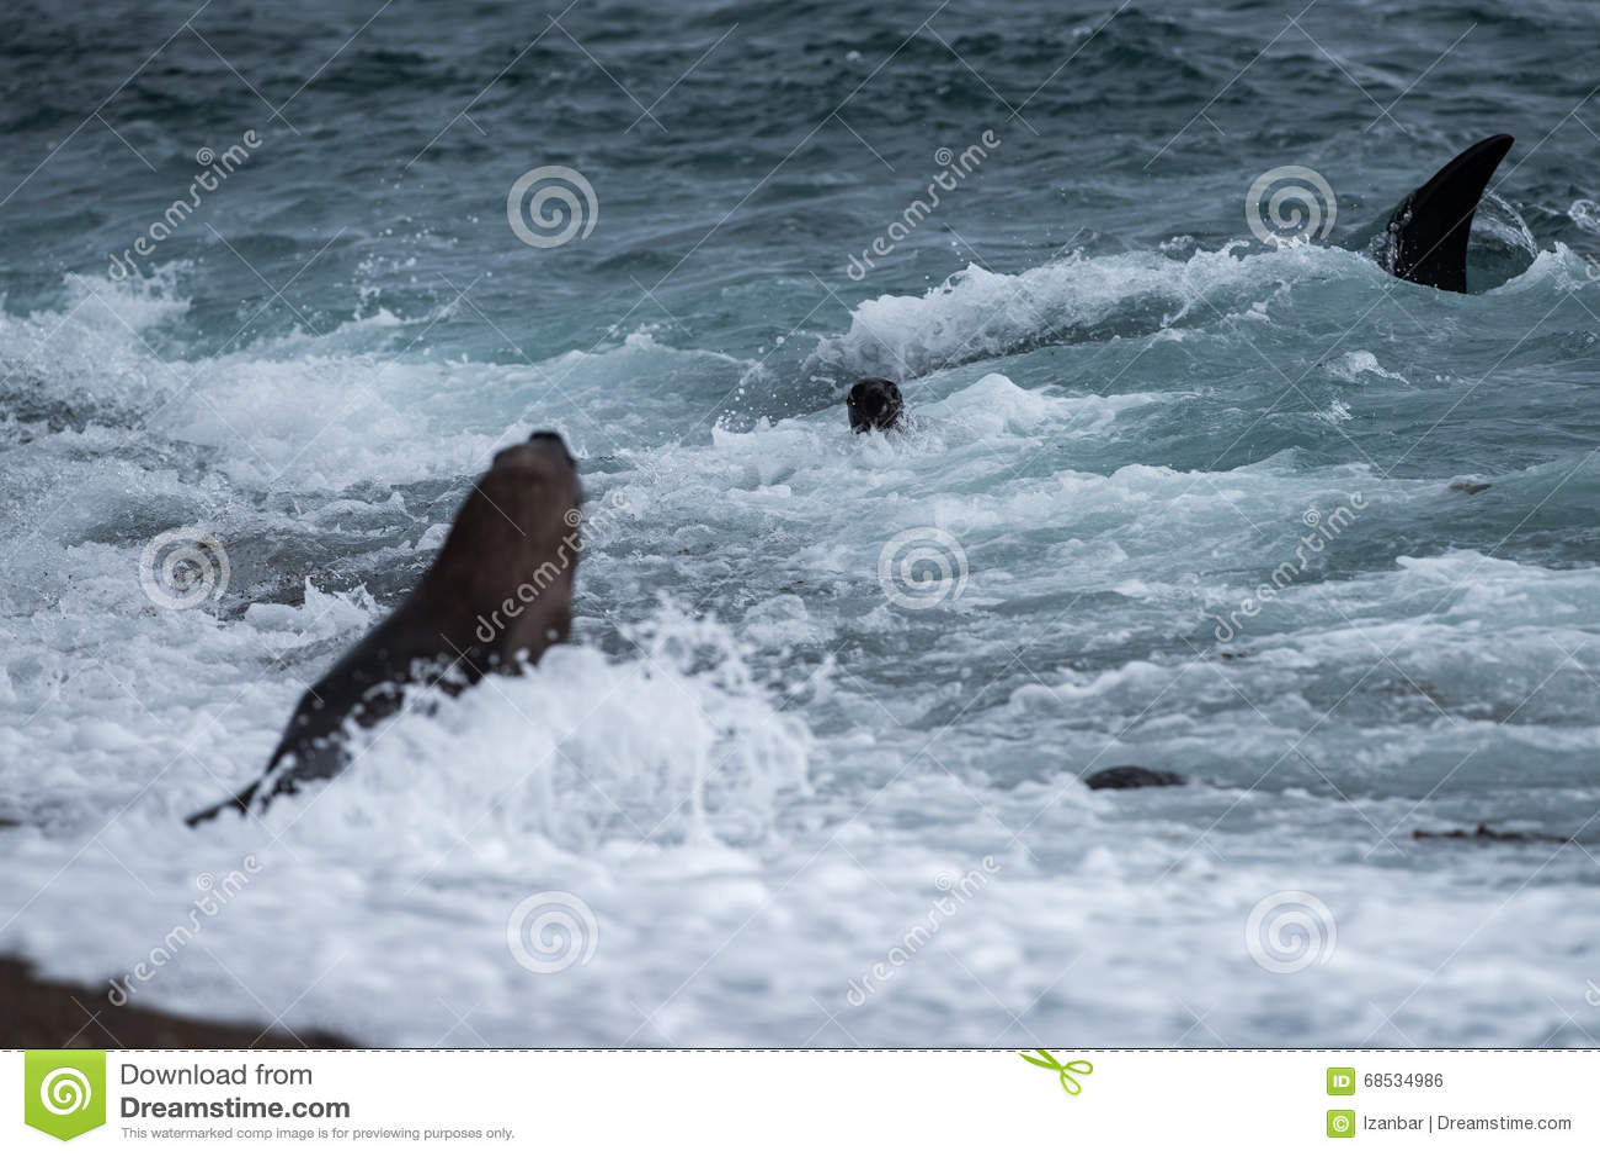 Killer Whale Attacks Seal On Beach